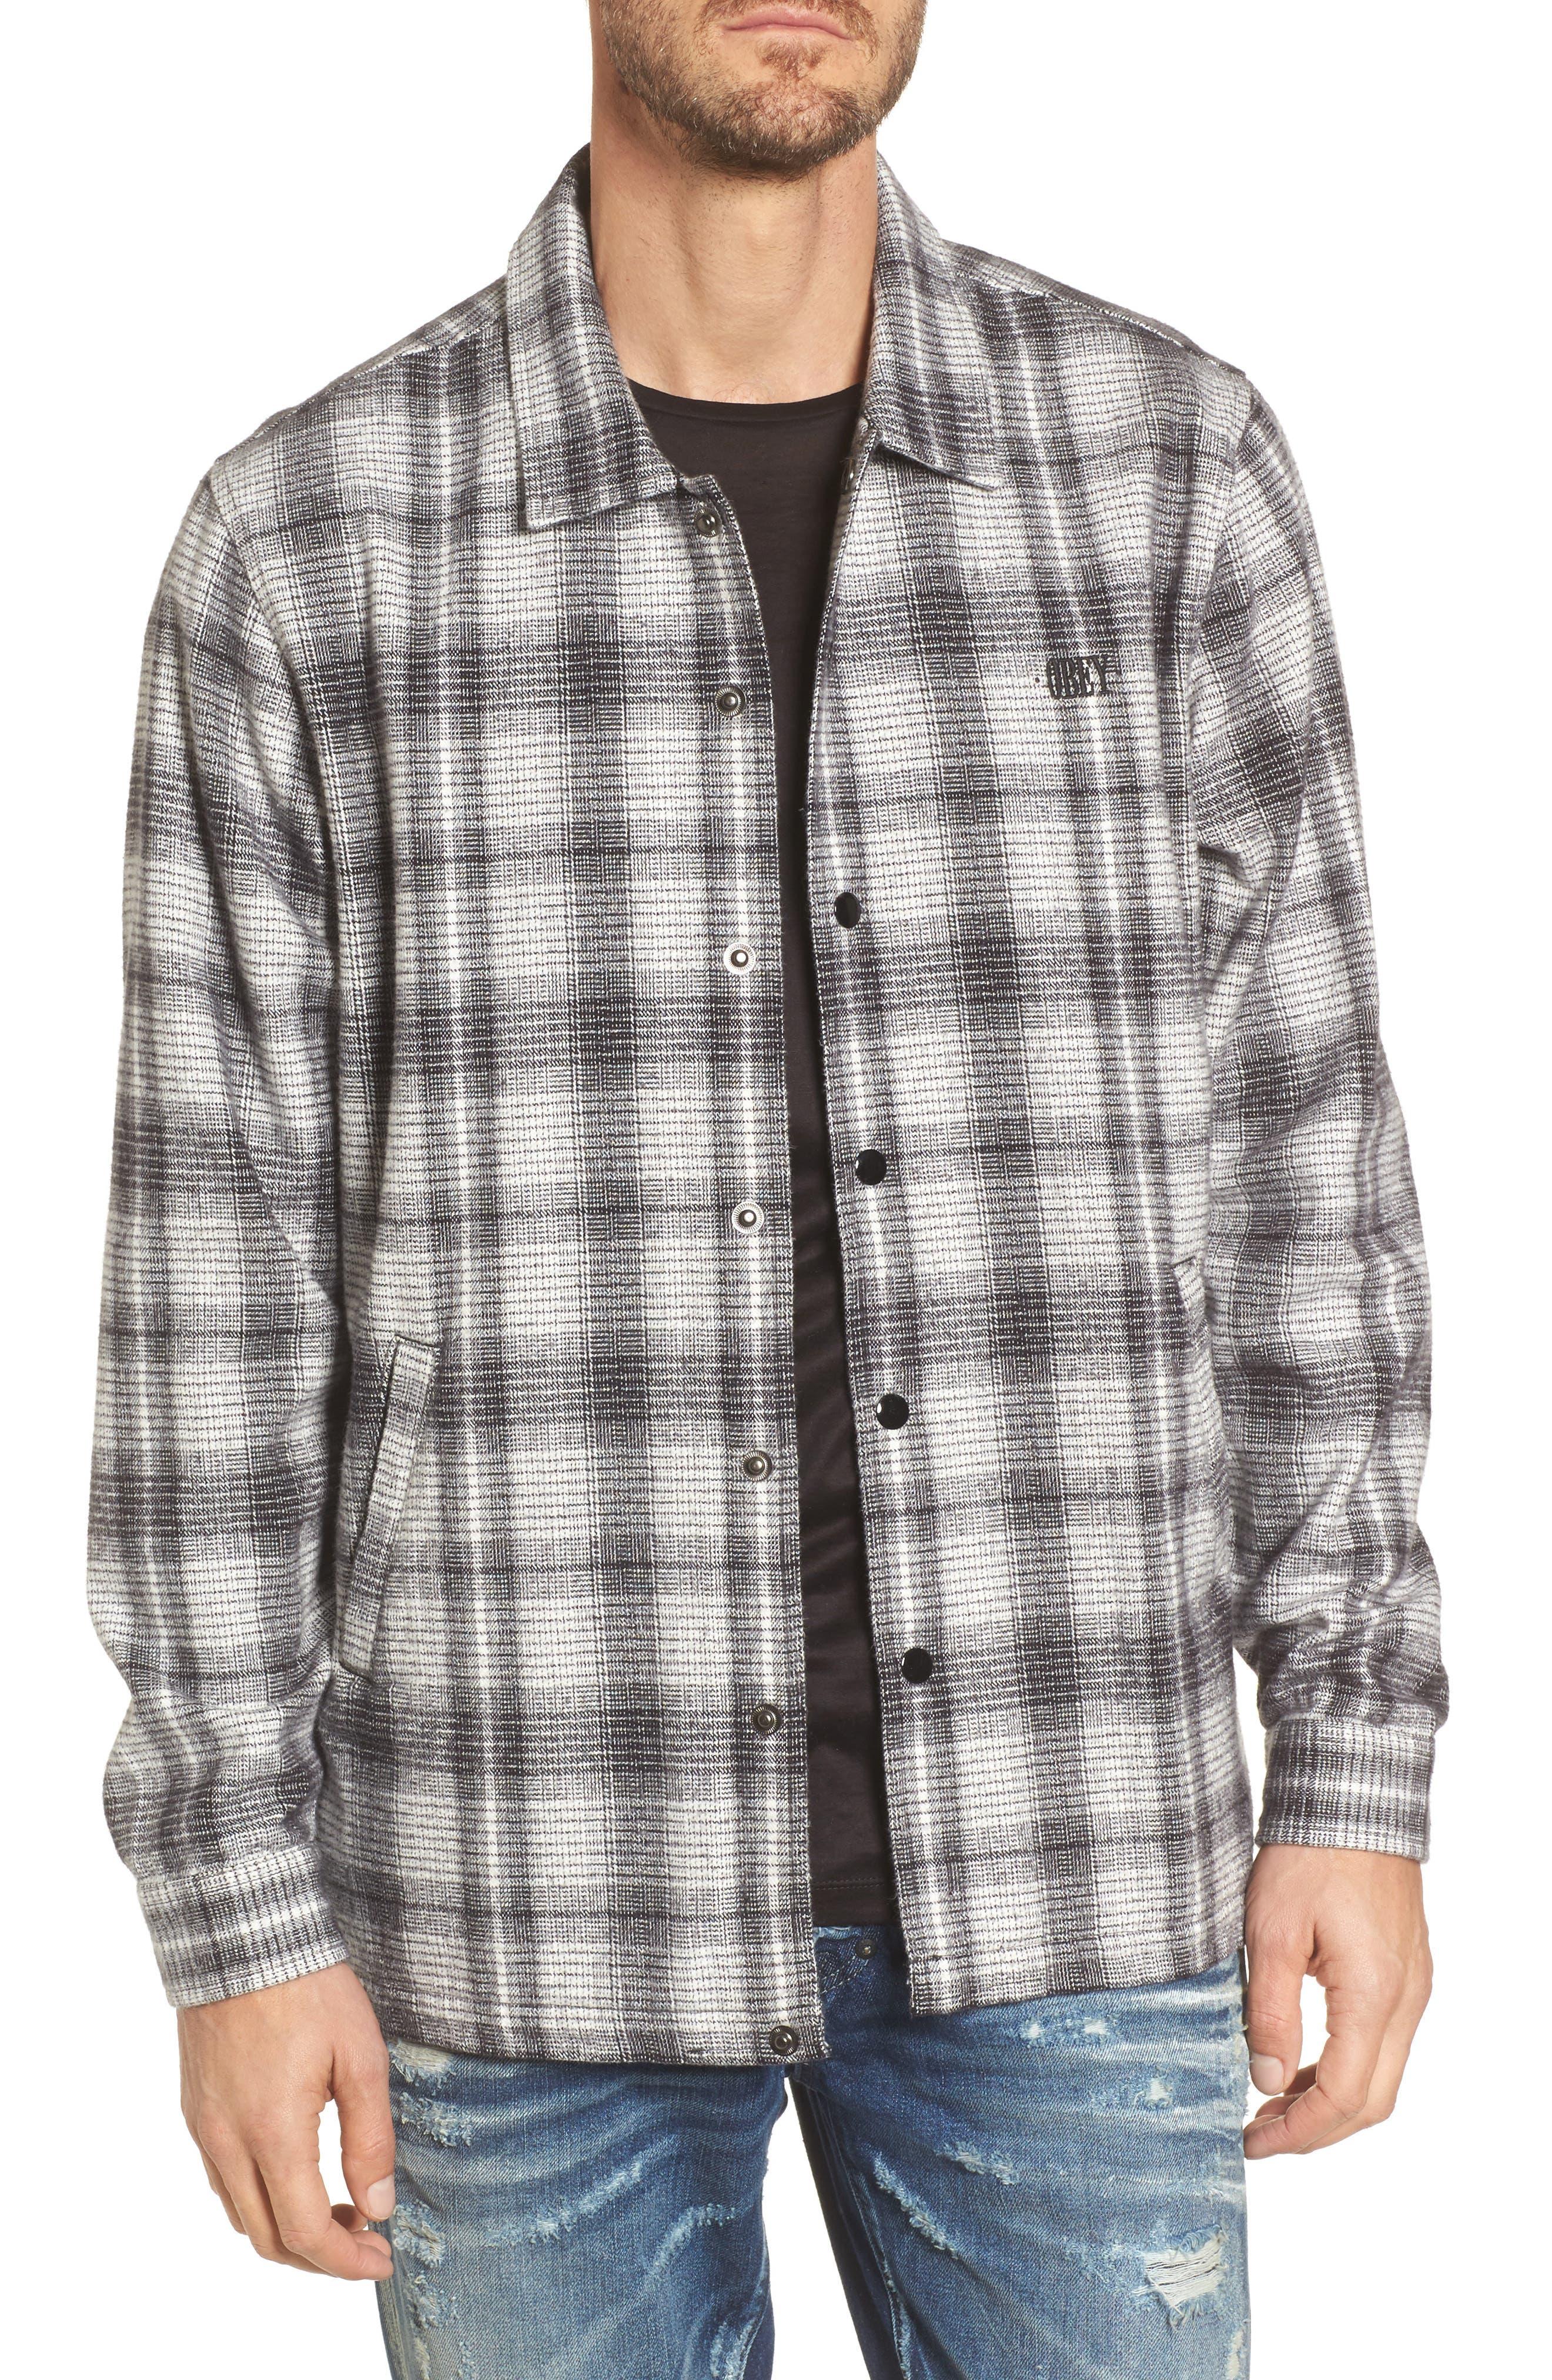 Obey Whittier Plaid Flannel Shirt Jacket